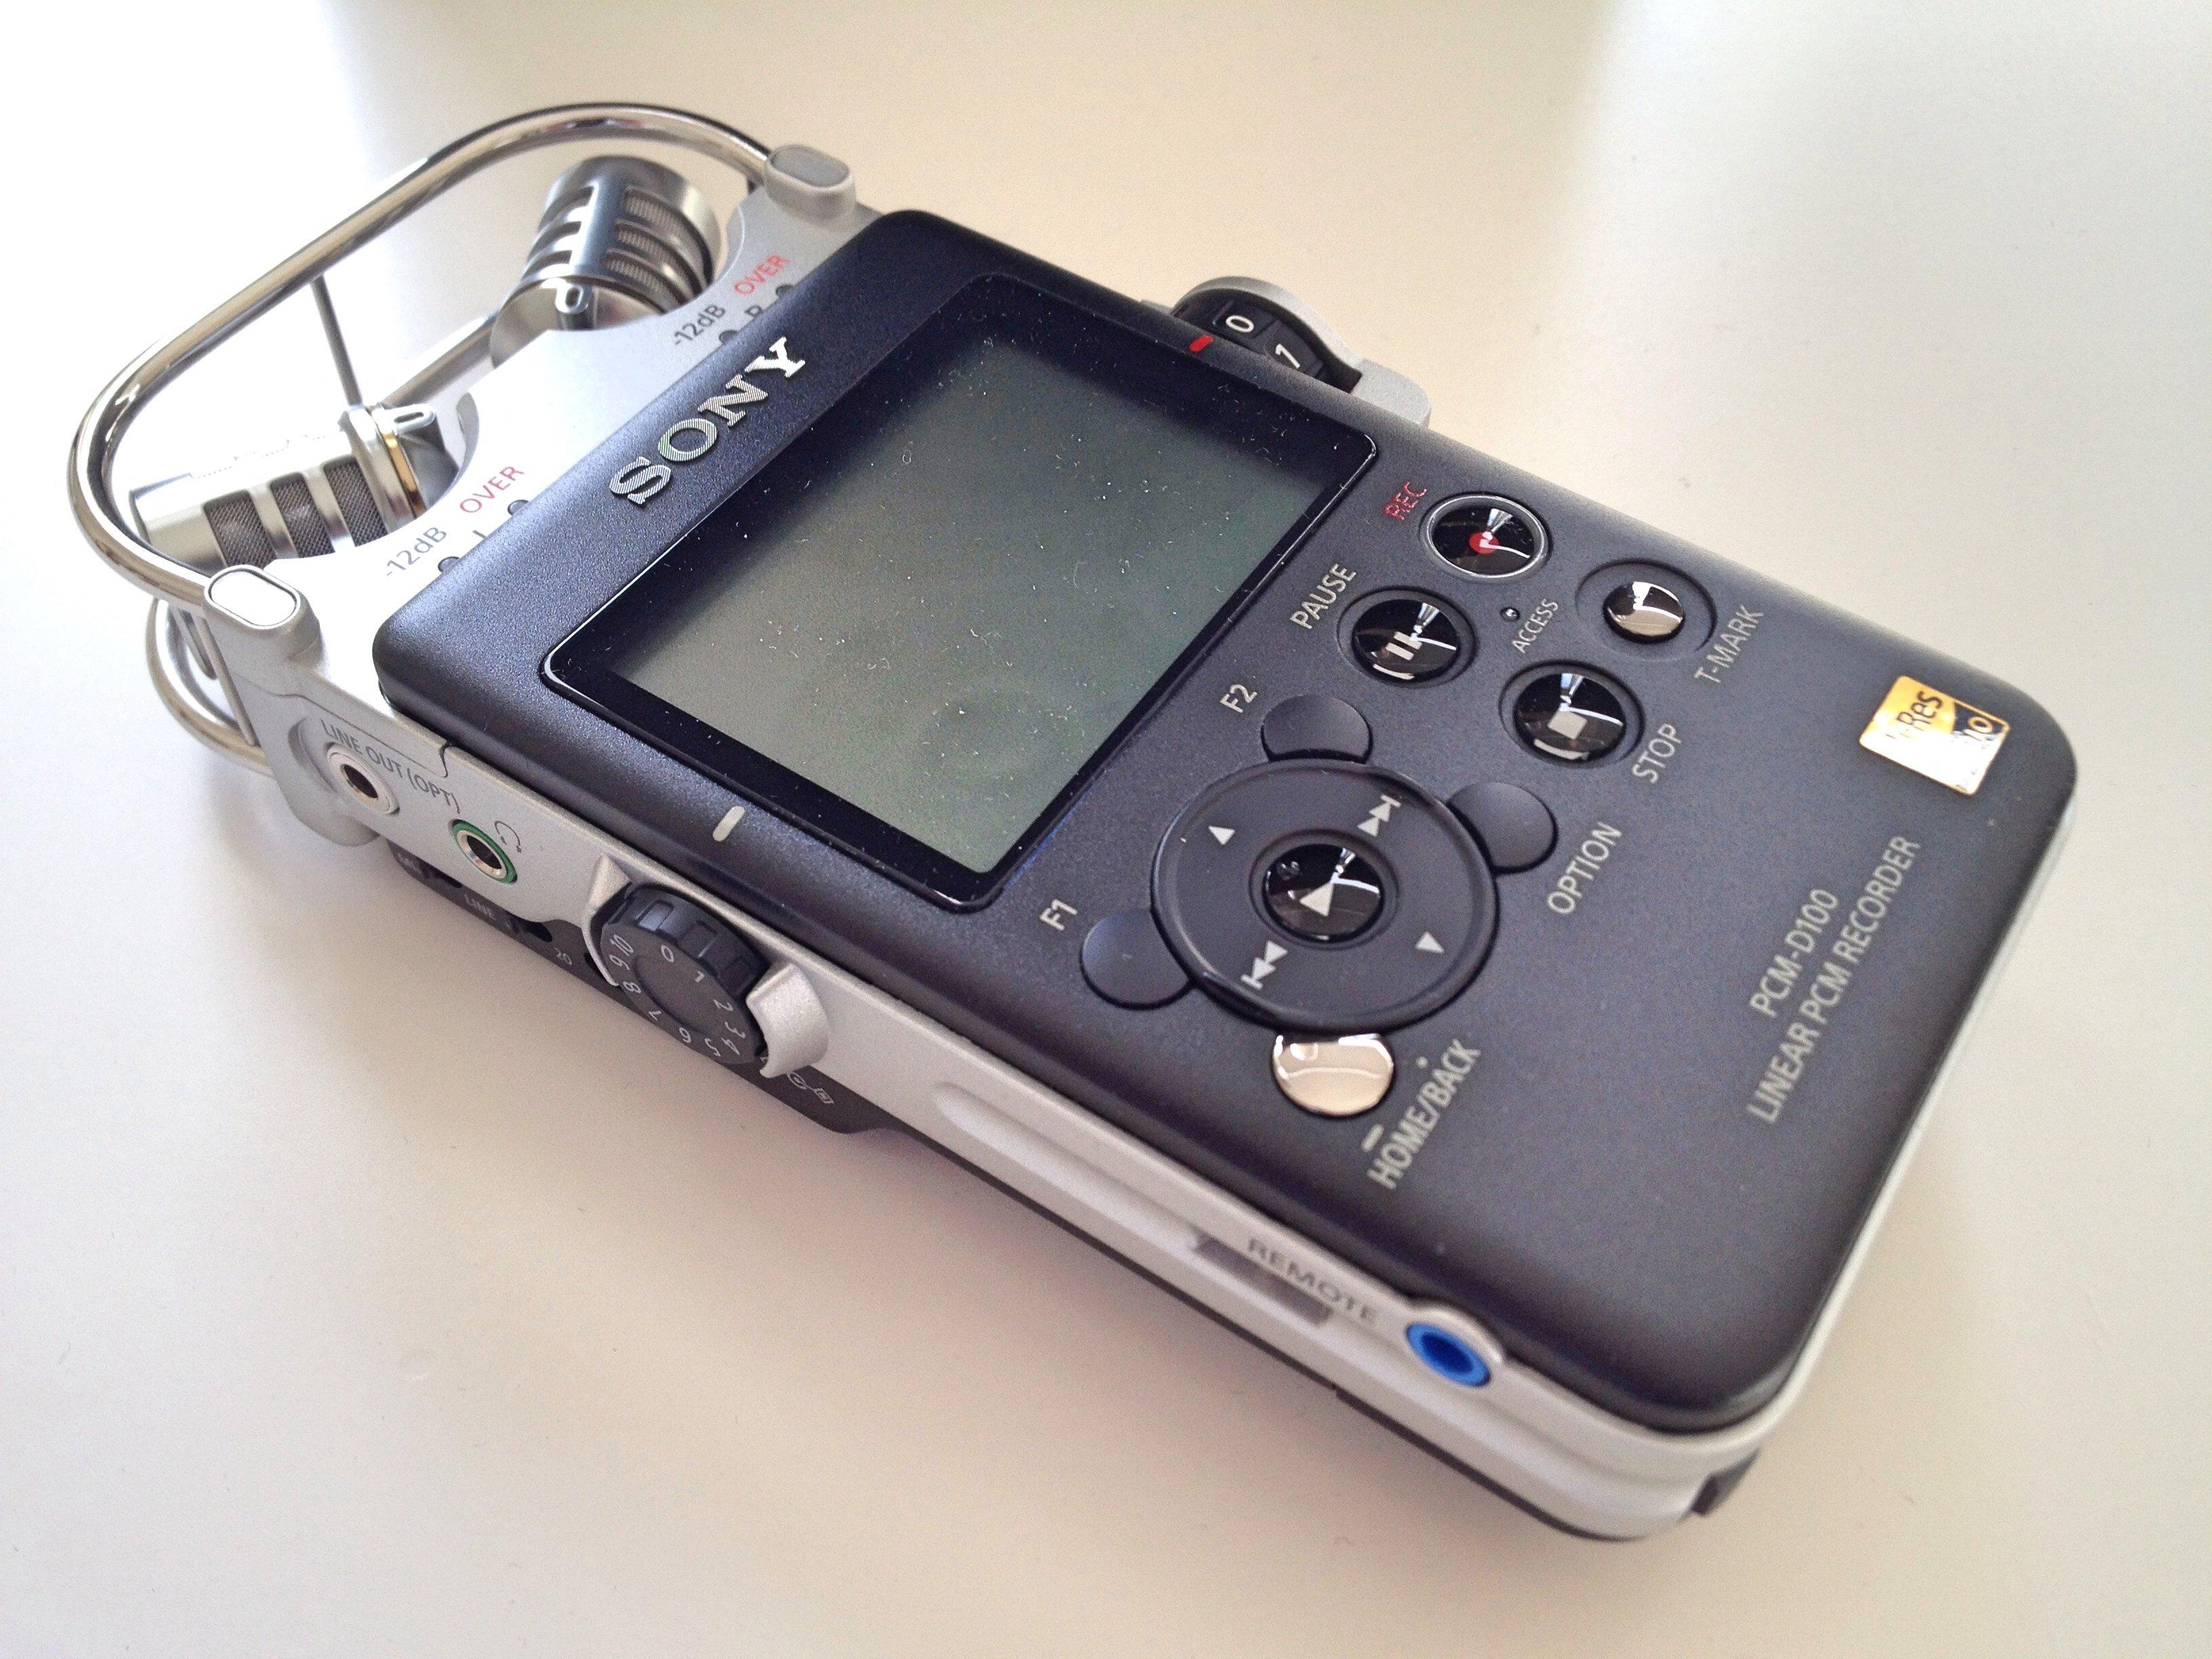 Sony PCM-D100 Angle